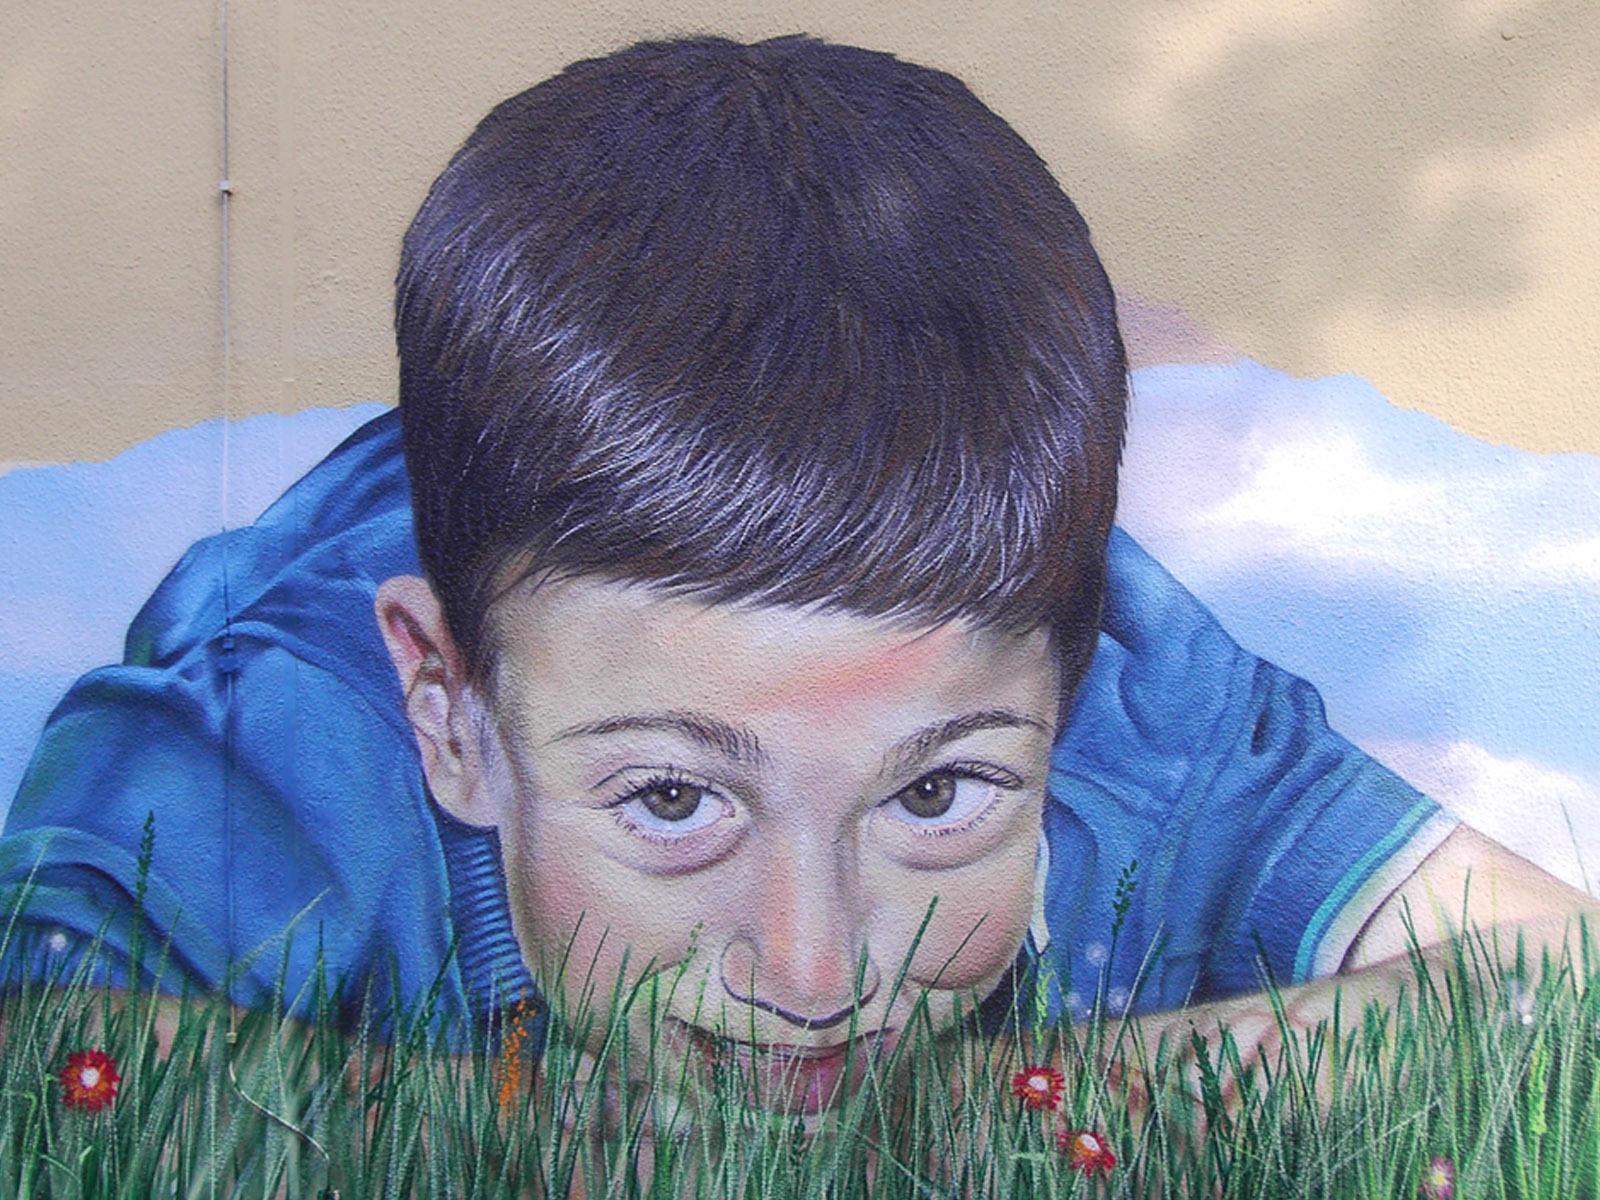 graffitiauftrag-graffitikuenstler-artmos4-evo-mensch-pflanzen-fotorealistisch